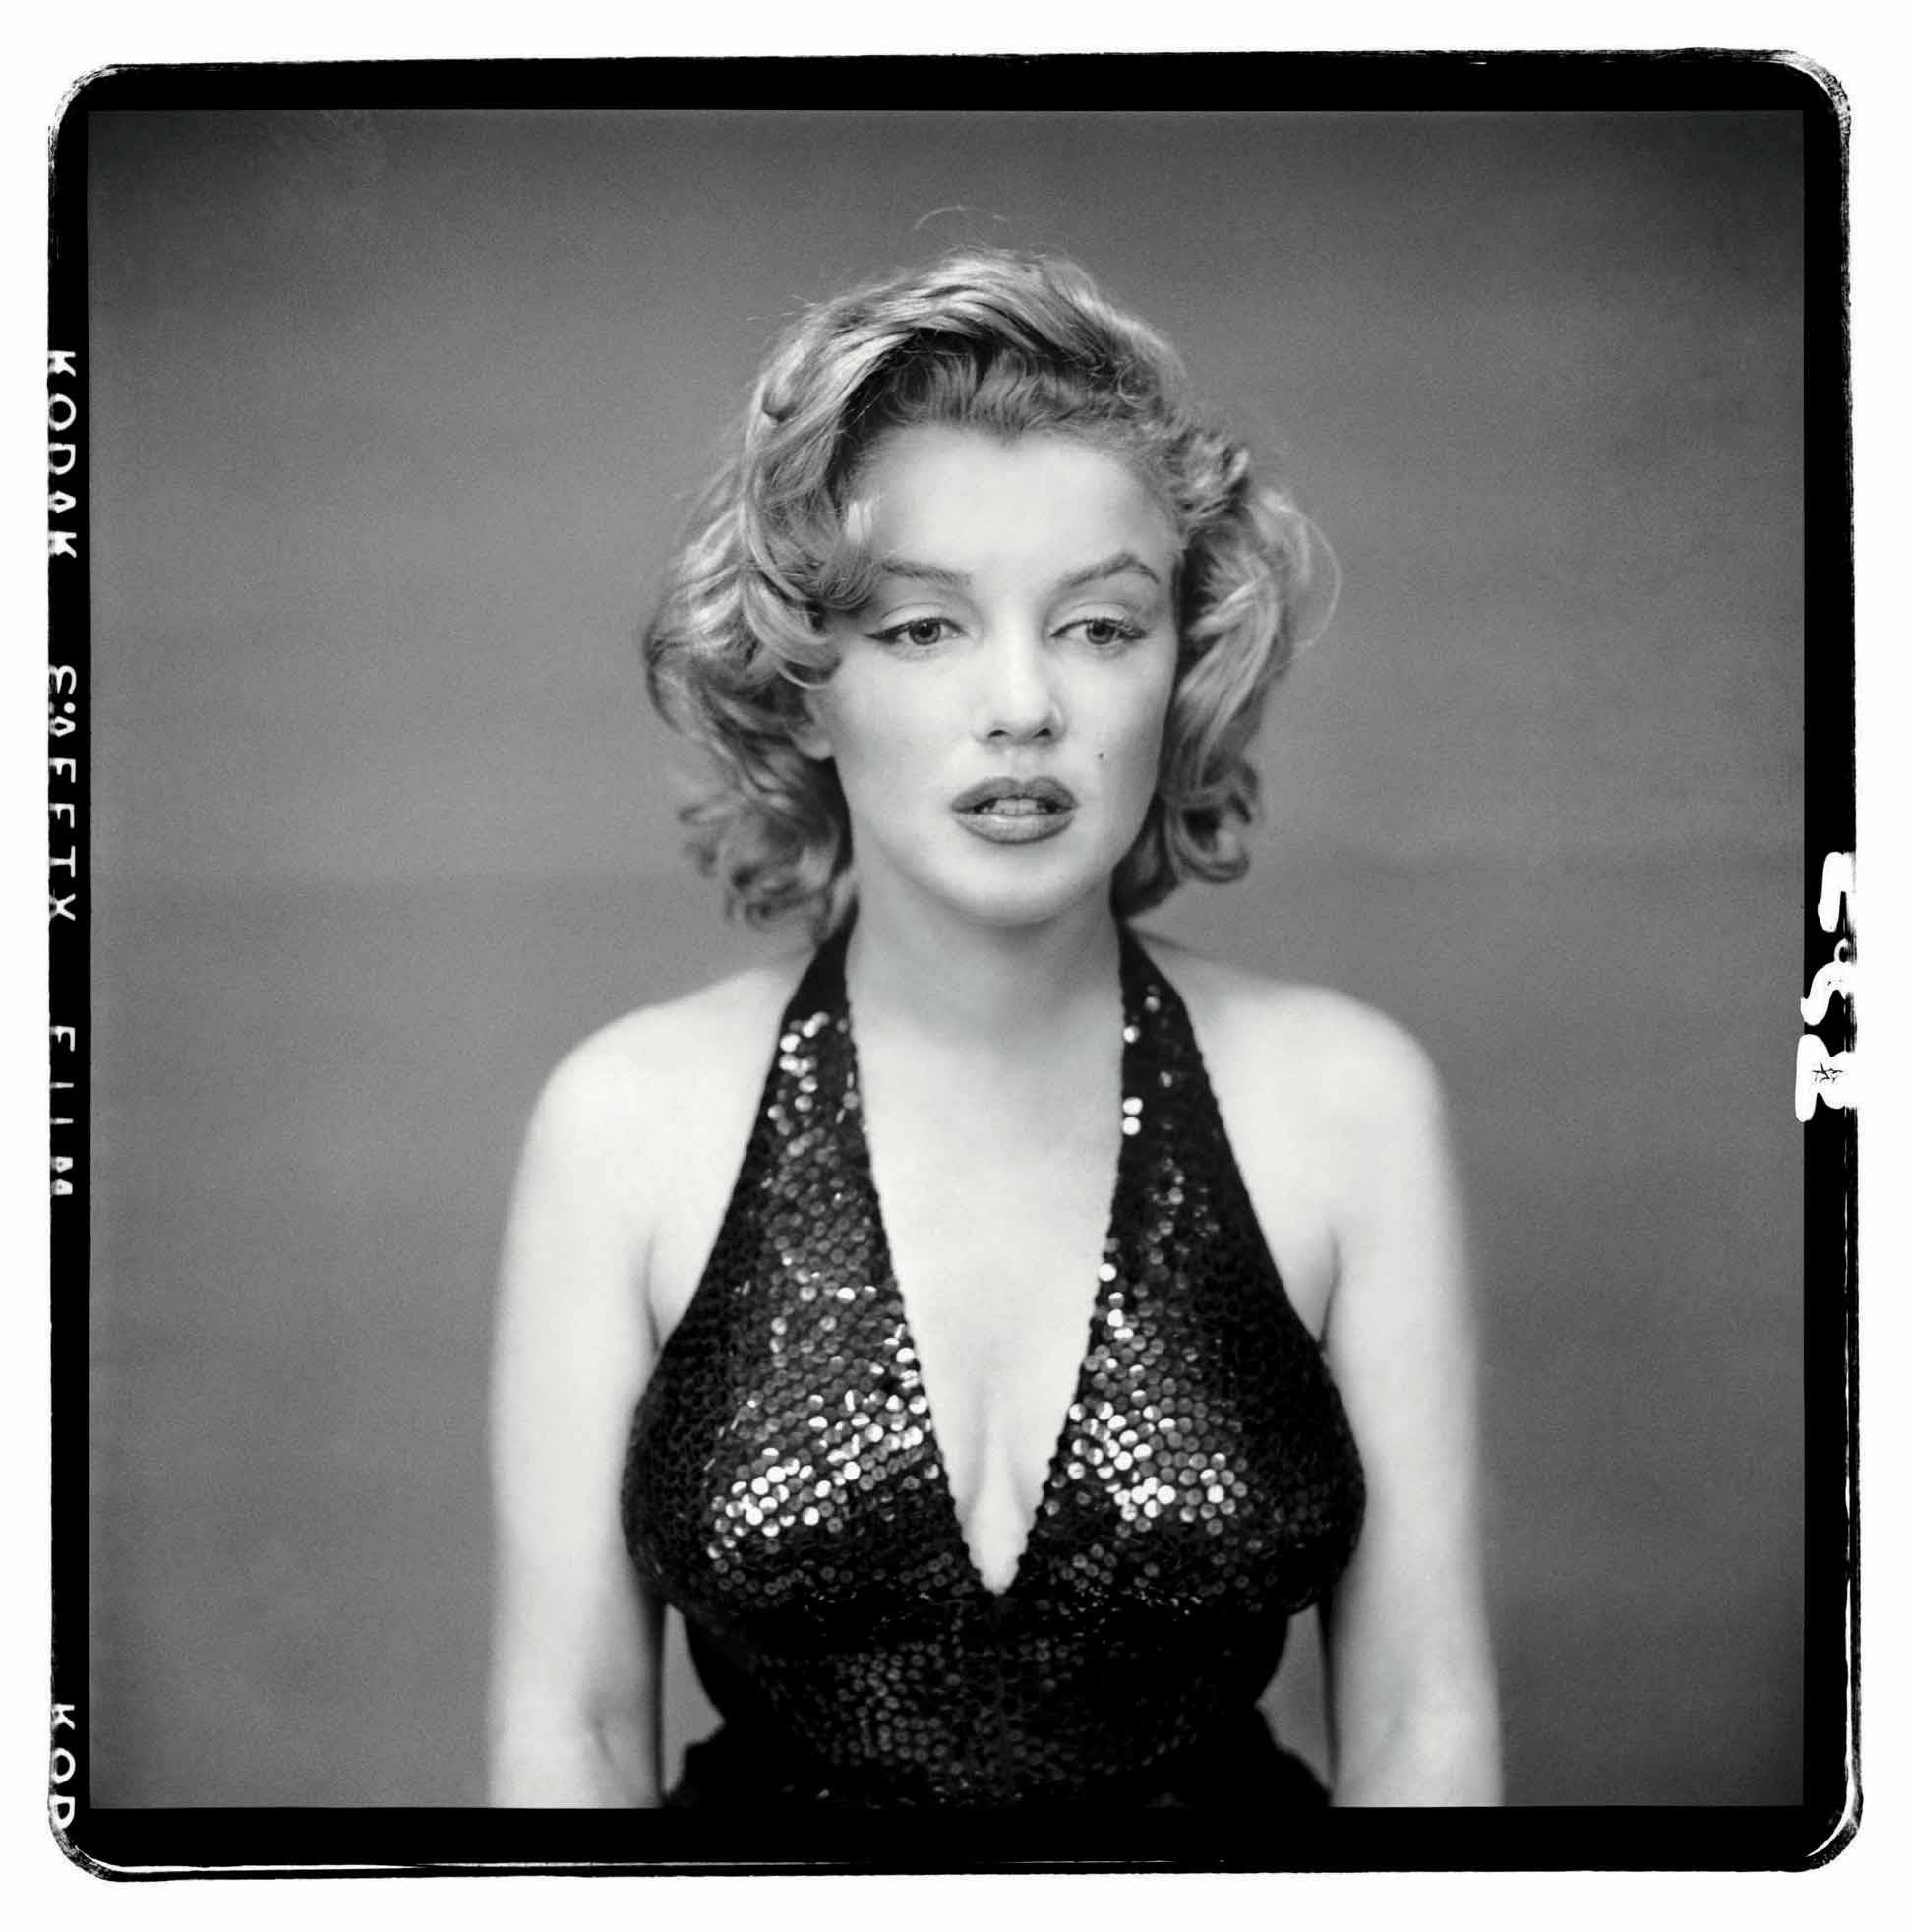 Marilyn Monroe, actress, New York City, May 1957